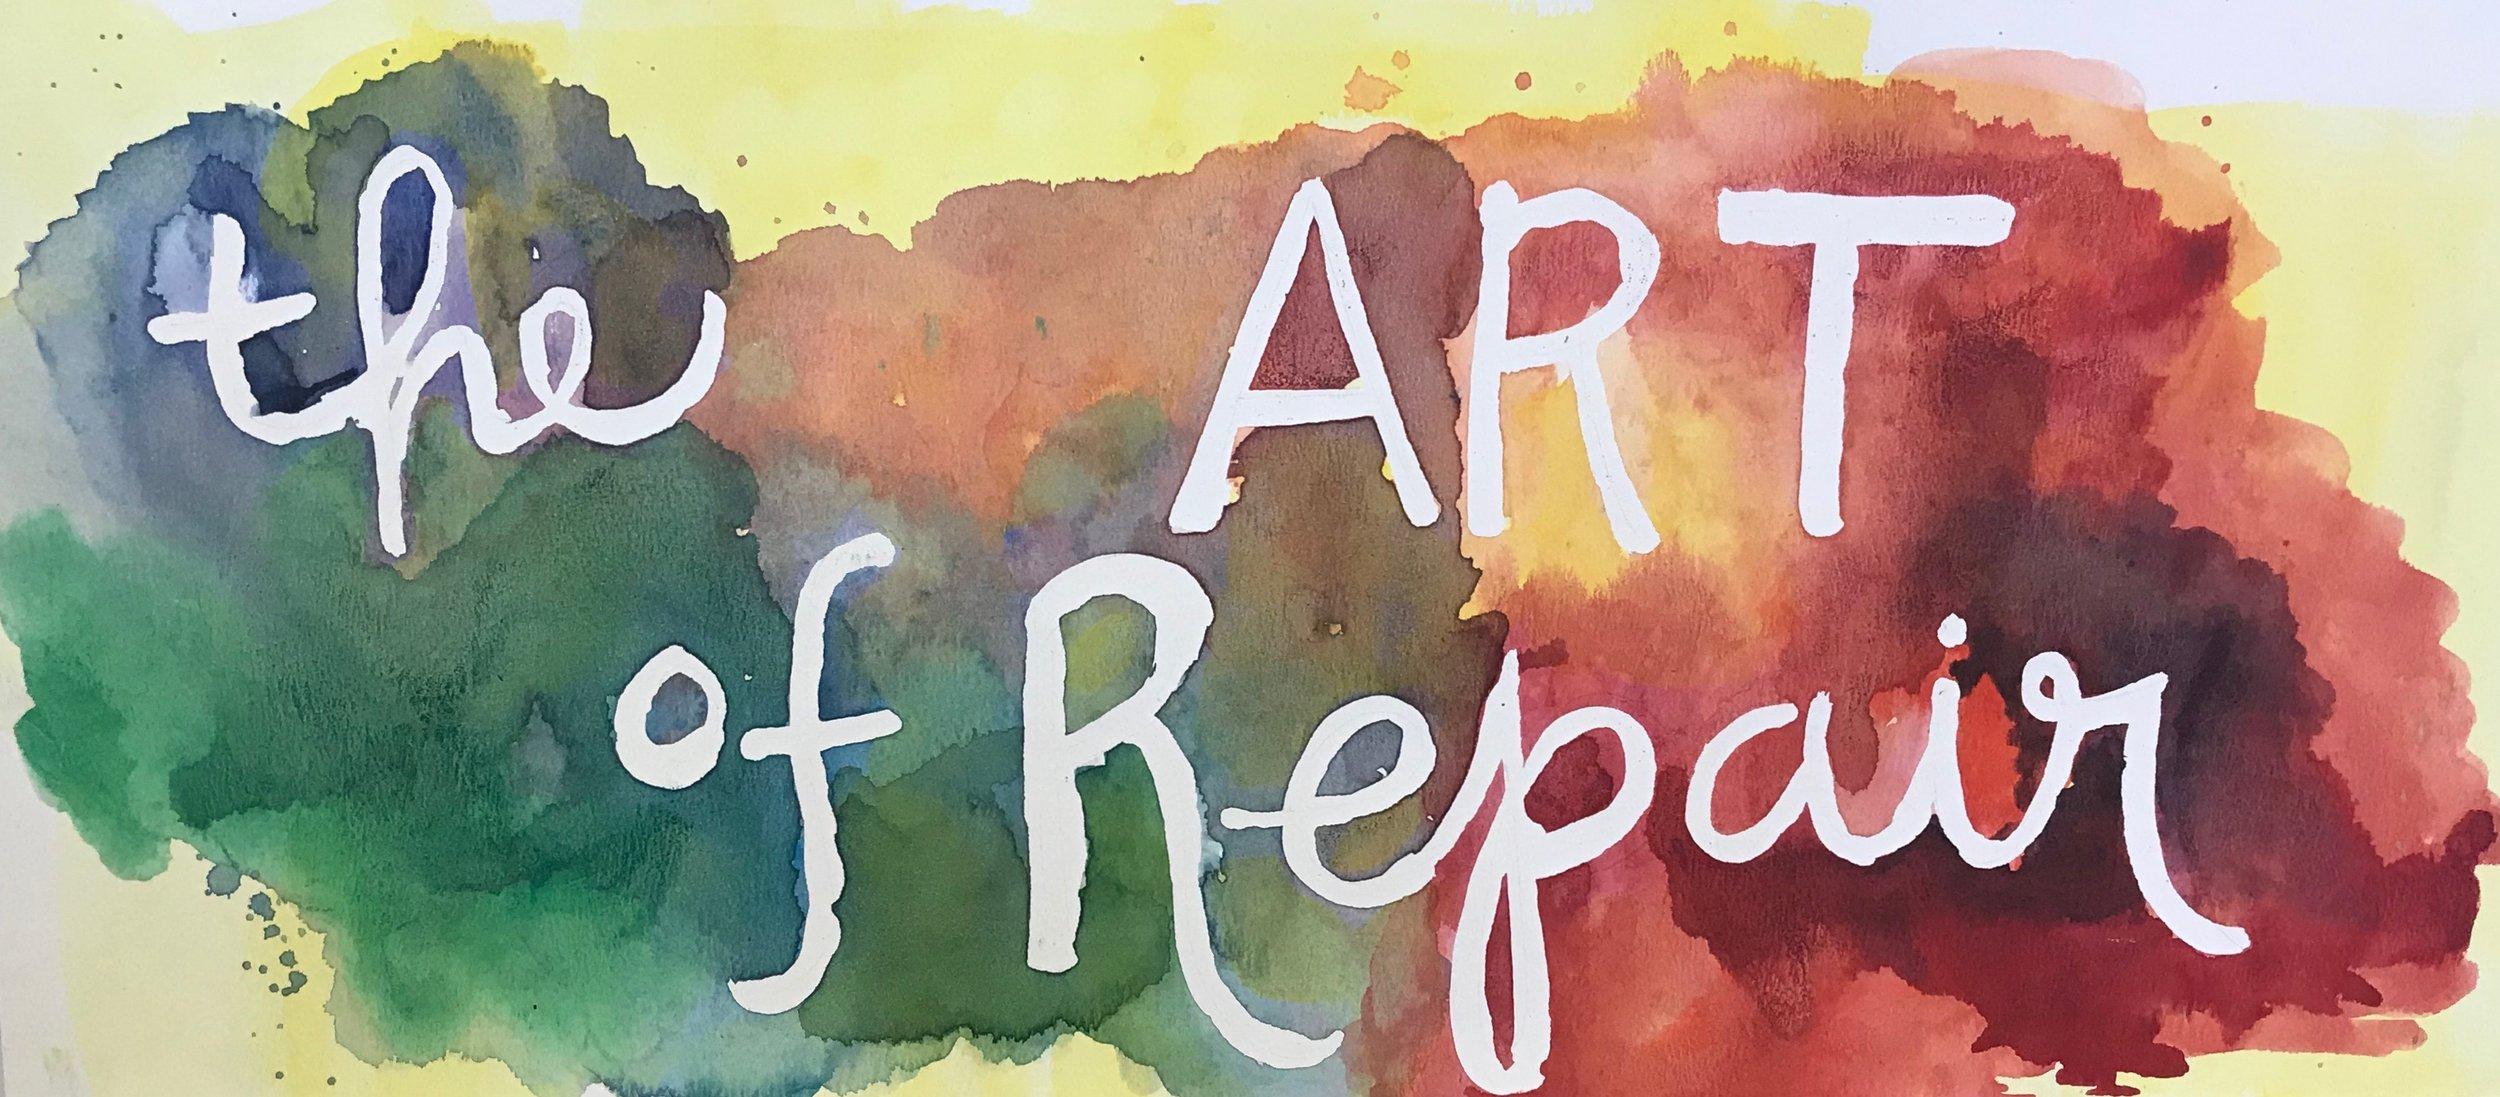 THE ART OF REPAIR: A MIDDLE SCHOOL选修课程shaddha Soparawala, 2018 - 2019年助教 & 数学老师,奥克兰ASCEND中学